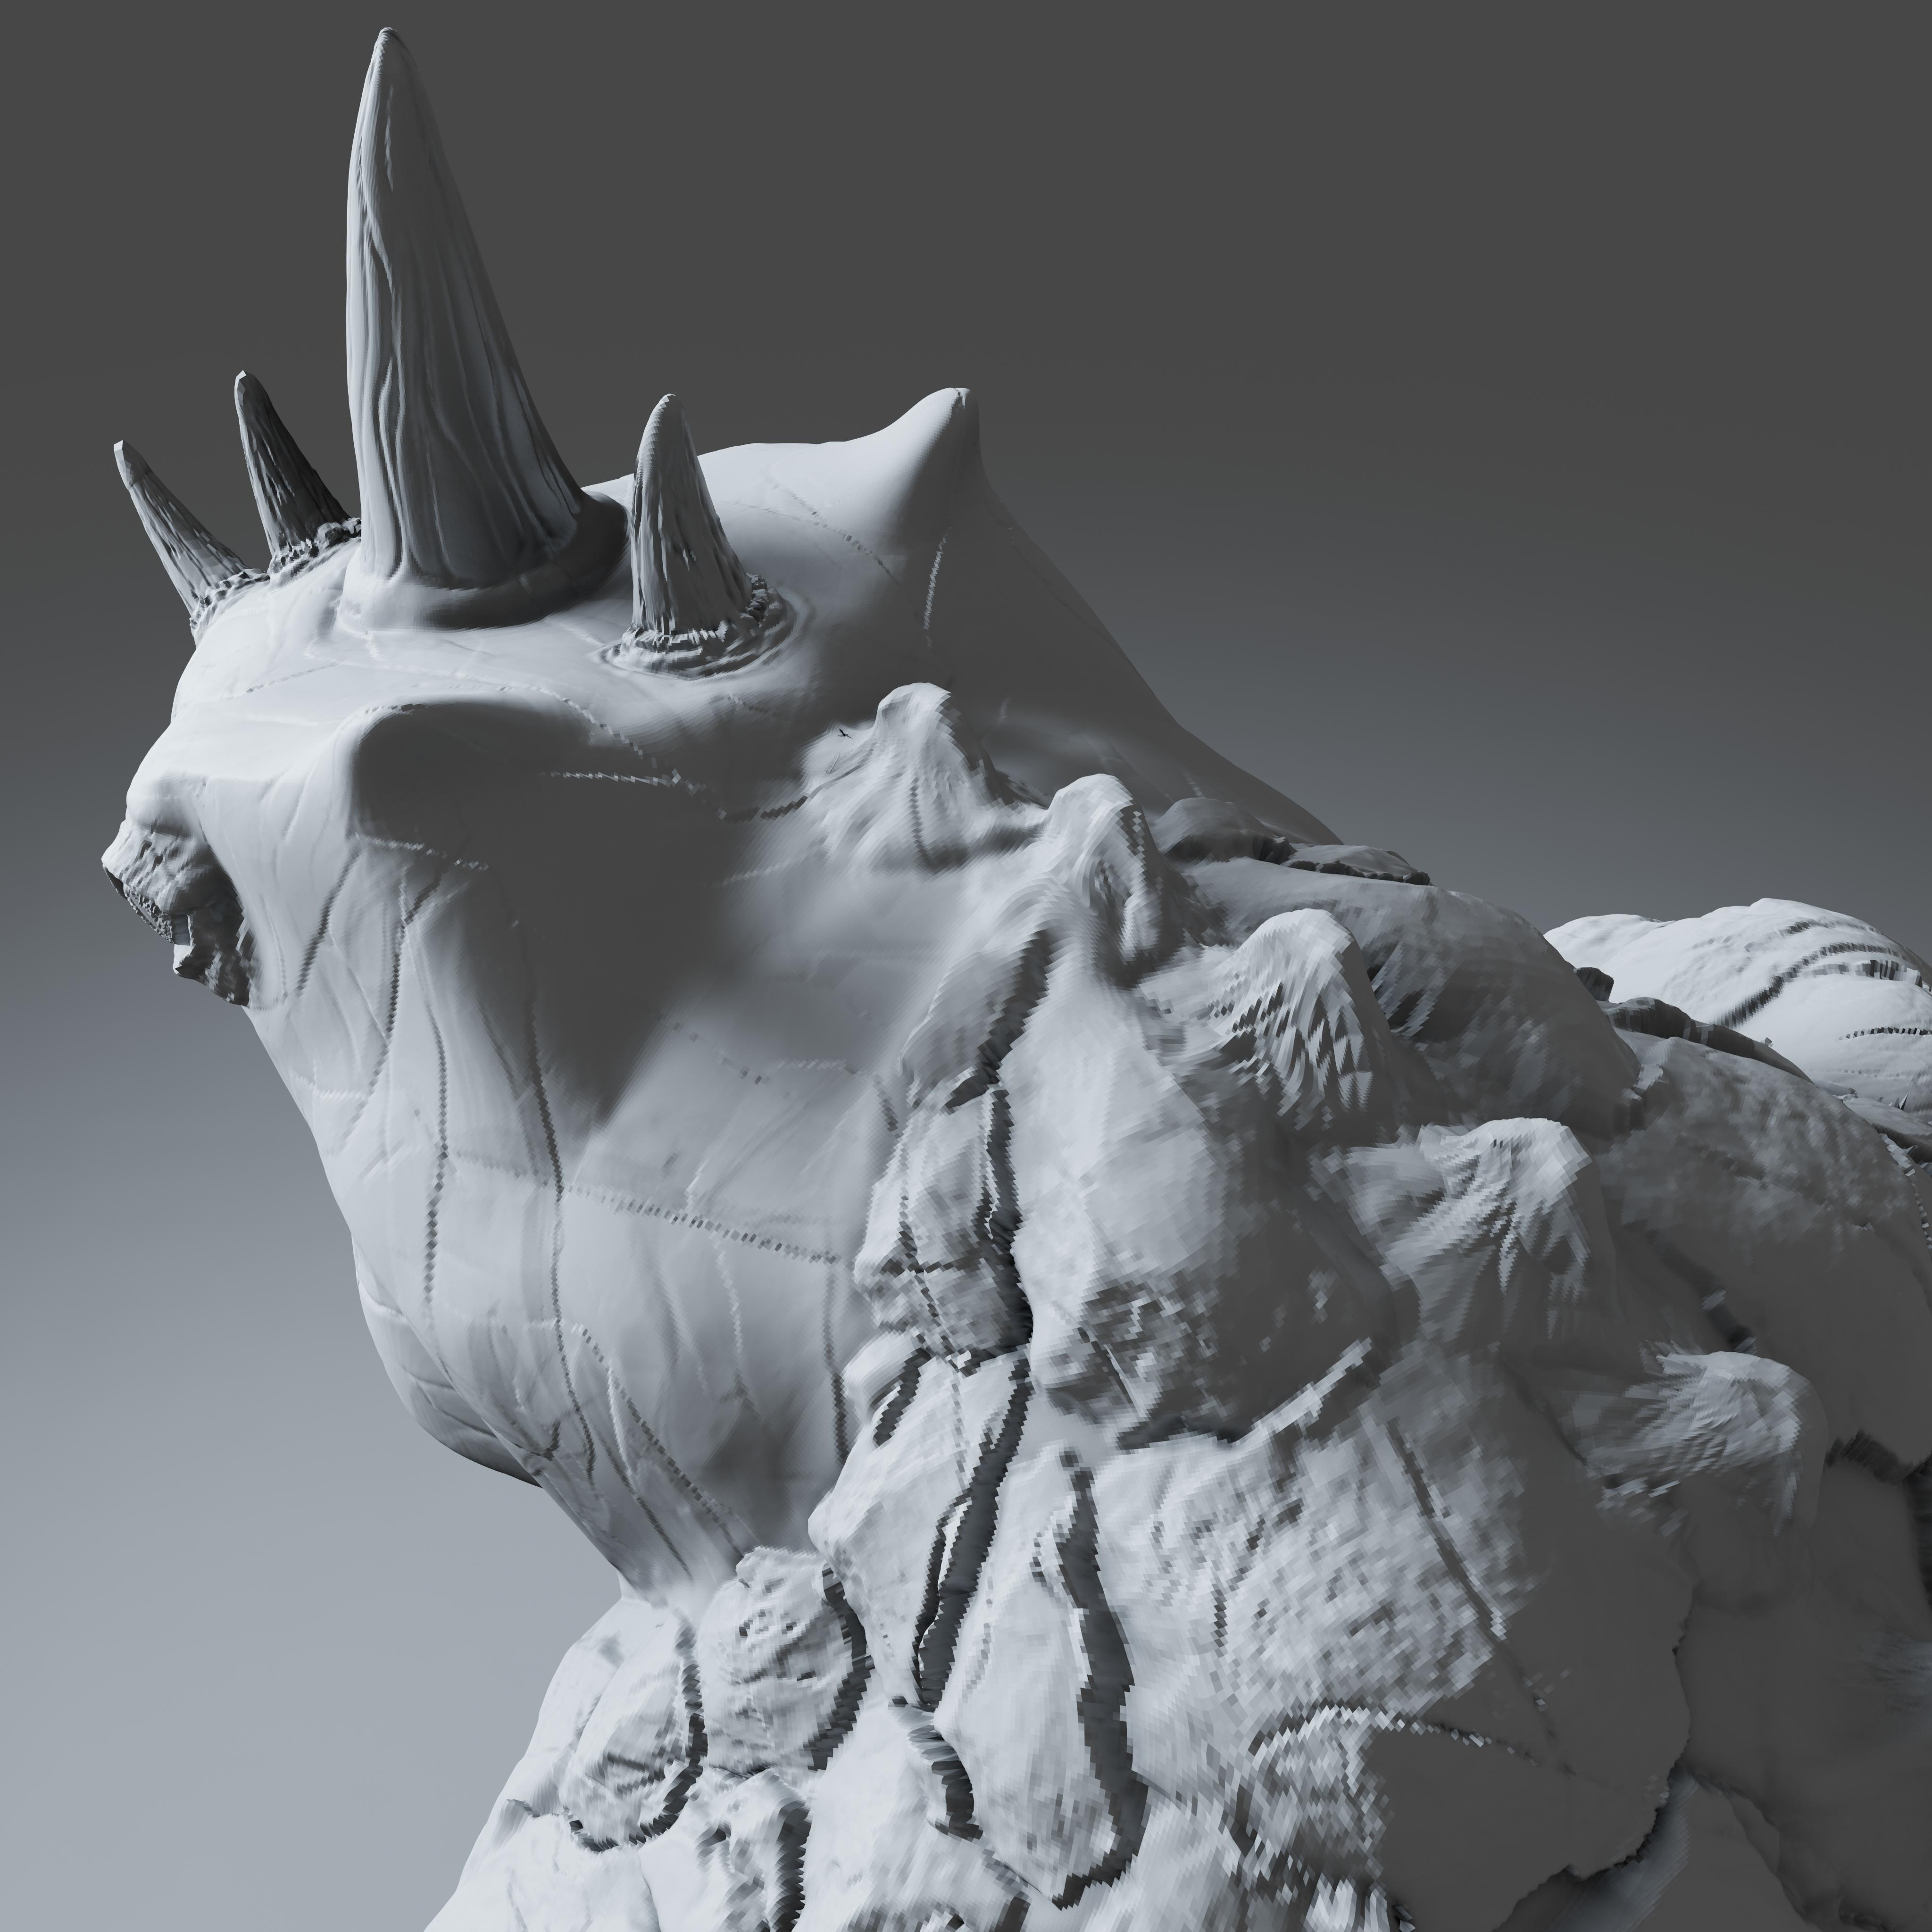 Preview10.jpg Download STL file Gorilla Turtle Monster - 3D Print Model • 3D printer object, DudeX